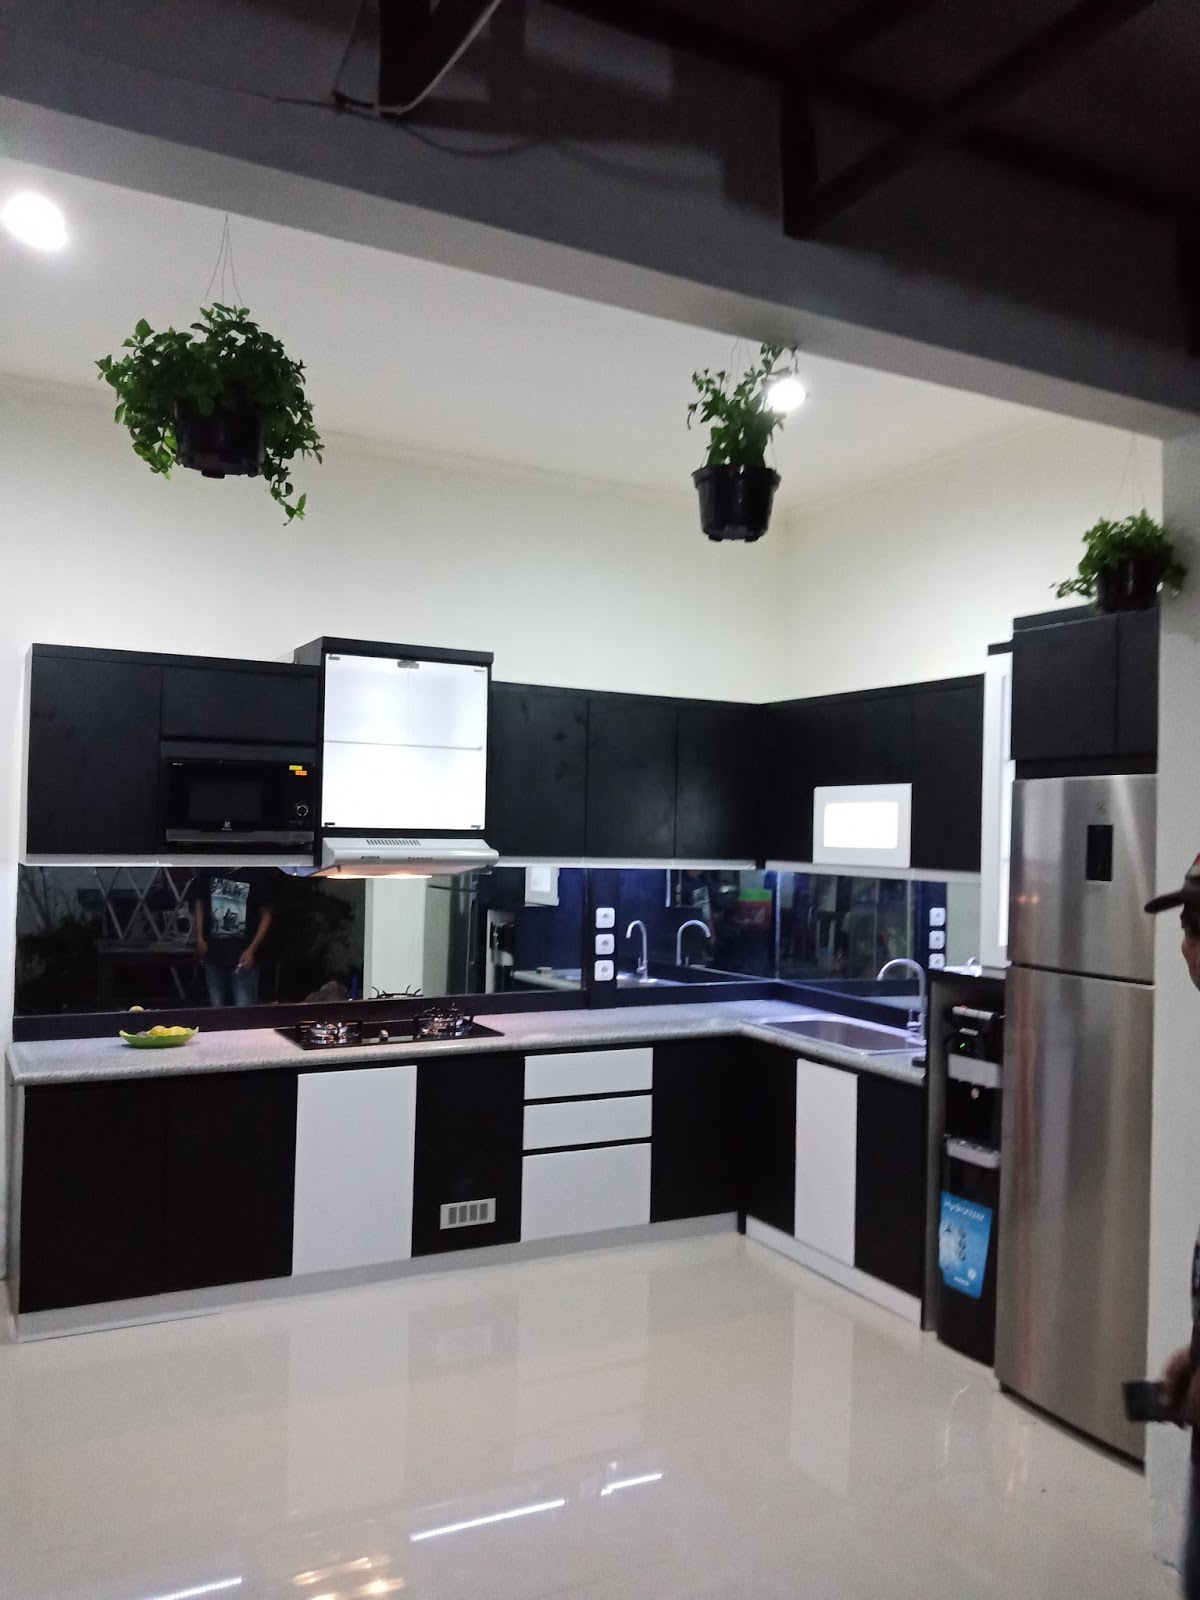 081215005567wa 085733377944kitchen set jogja kitchen set murah di jogja kitchen set minimalis di jogja harga kitchen set minimalis di desain kitchen